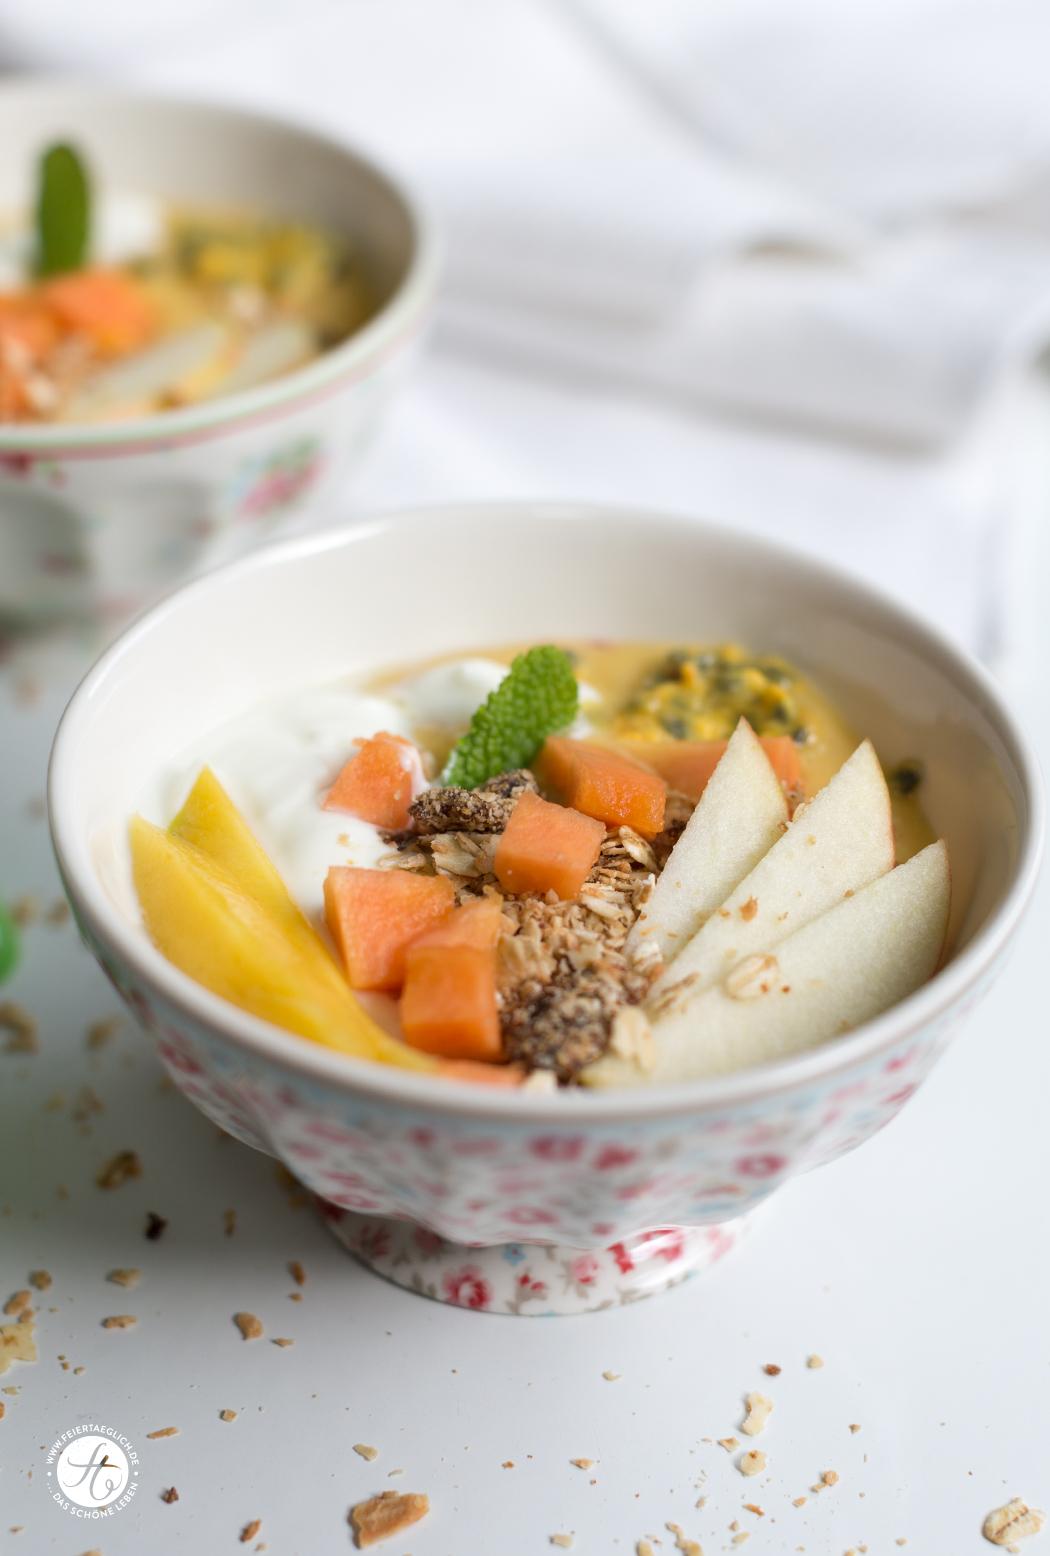 Schnelles Frühstücksglück: 3 x SmoothieBowl mit Mango: Mango-Nektarine-Erdbeere, Mango-Maracuja-Papaya, Mango-Basilikum